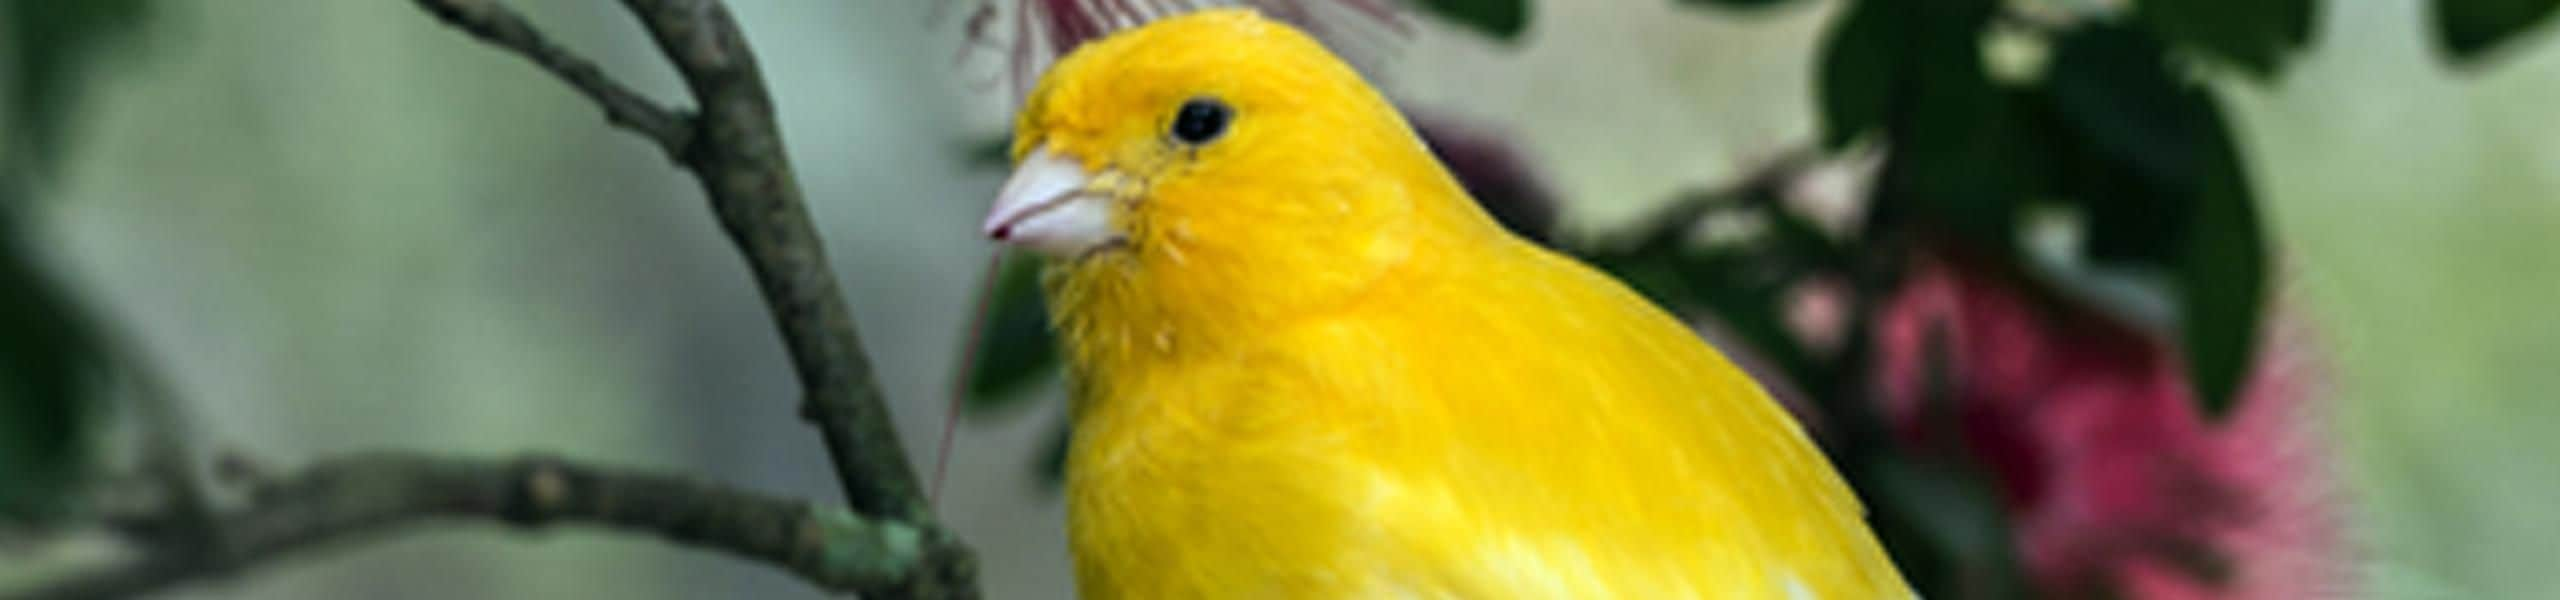 Domestic Canary